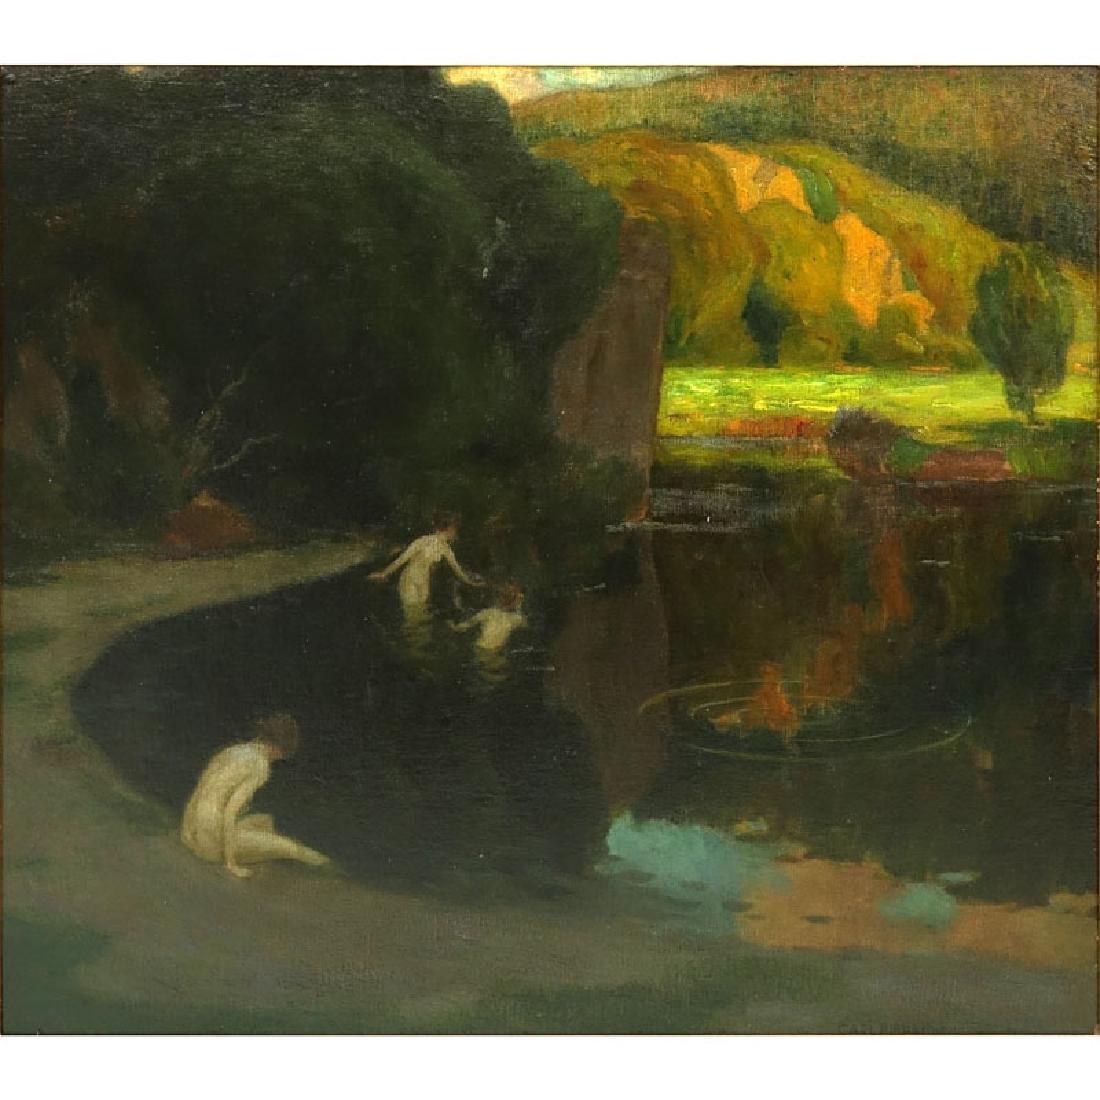 Karl Johann Nikolaus Piepho, Germany (1869 - 1920) Oil